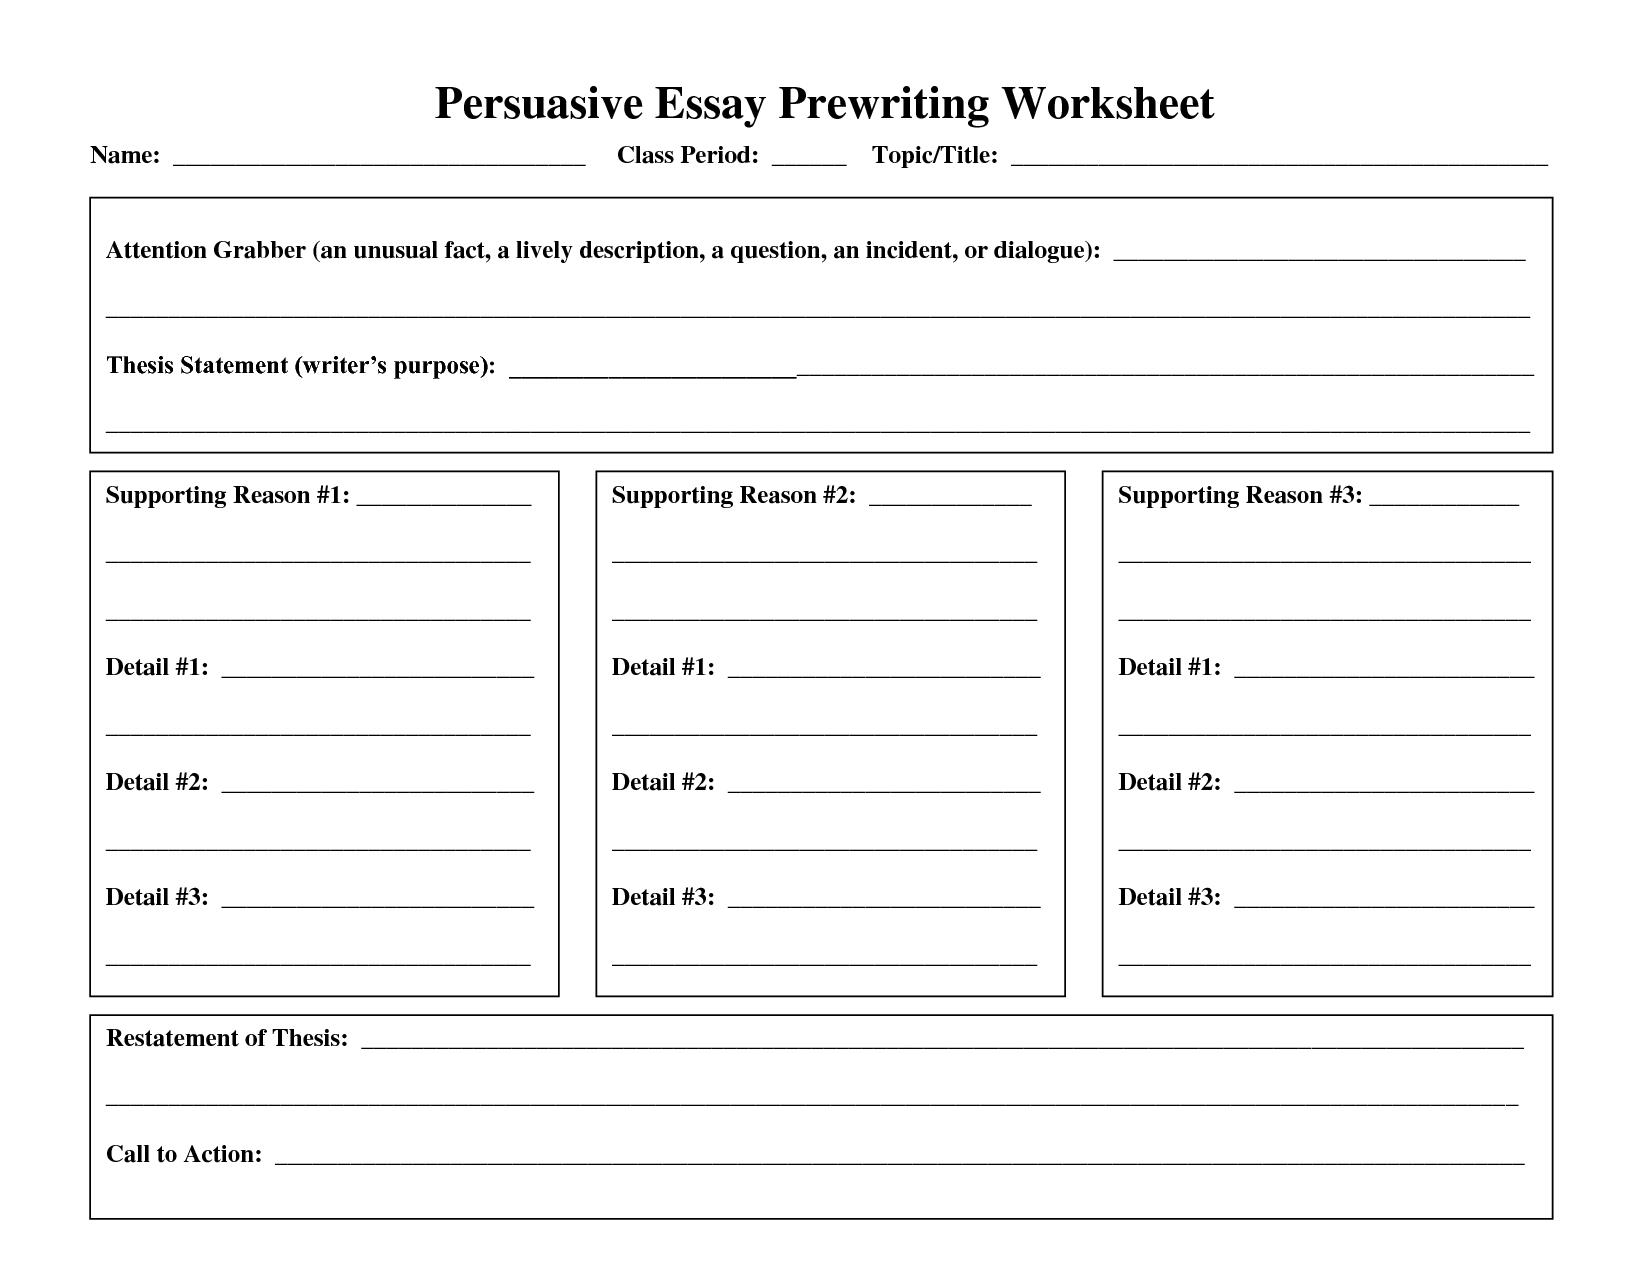 Persuassion Essay Worksheet Google Search Writing Worksheets Essay Outline Reading Comprehension Worksheets [ 1275 x 1650 Pixel ]